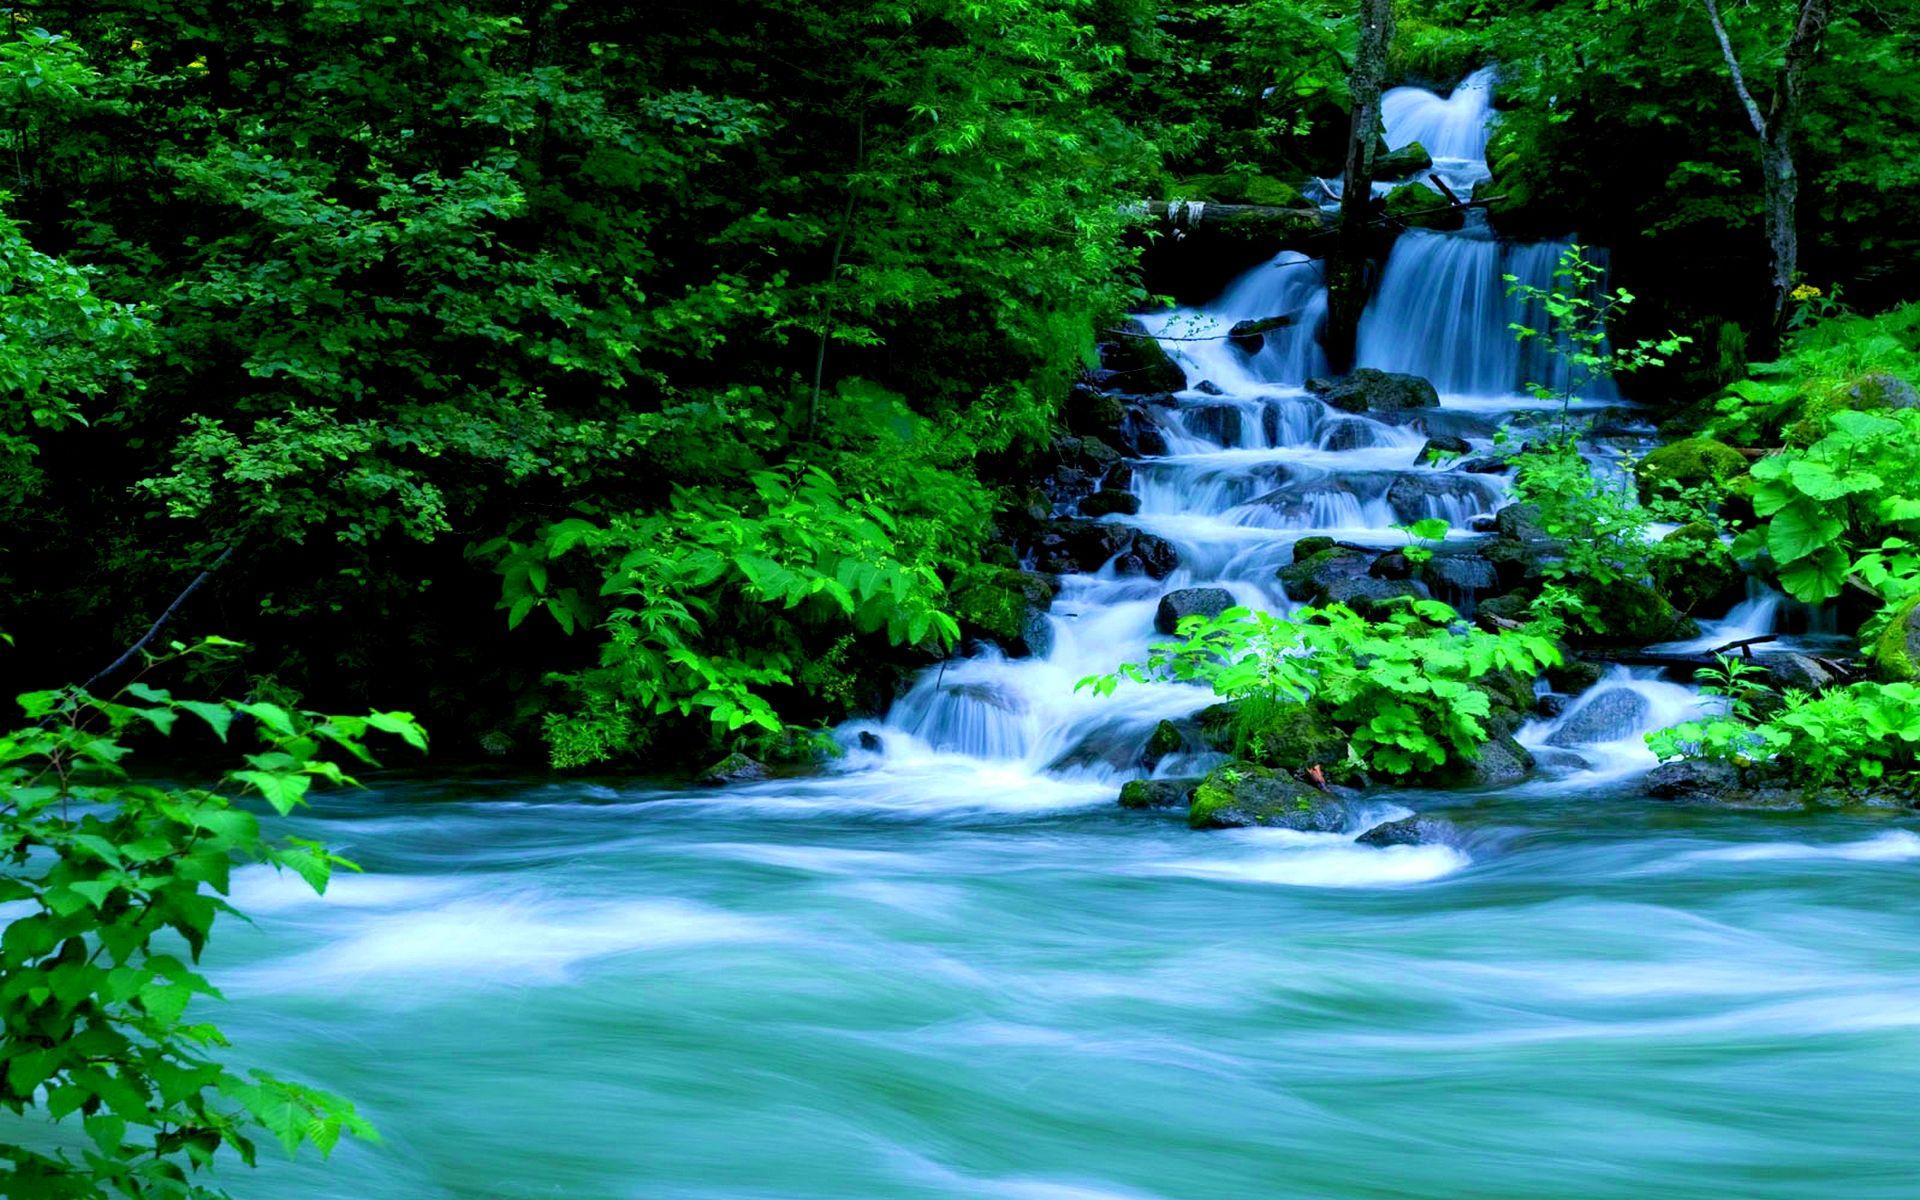 Forest Waterfalls 1497063 Waterfall Wallpaper Forest Waterfall Waterfall